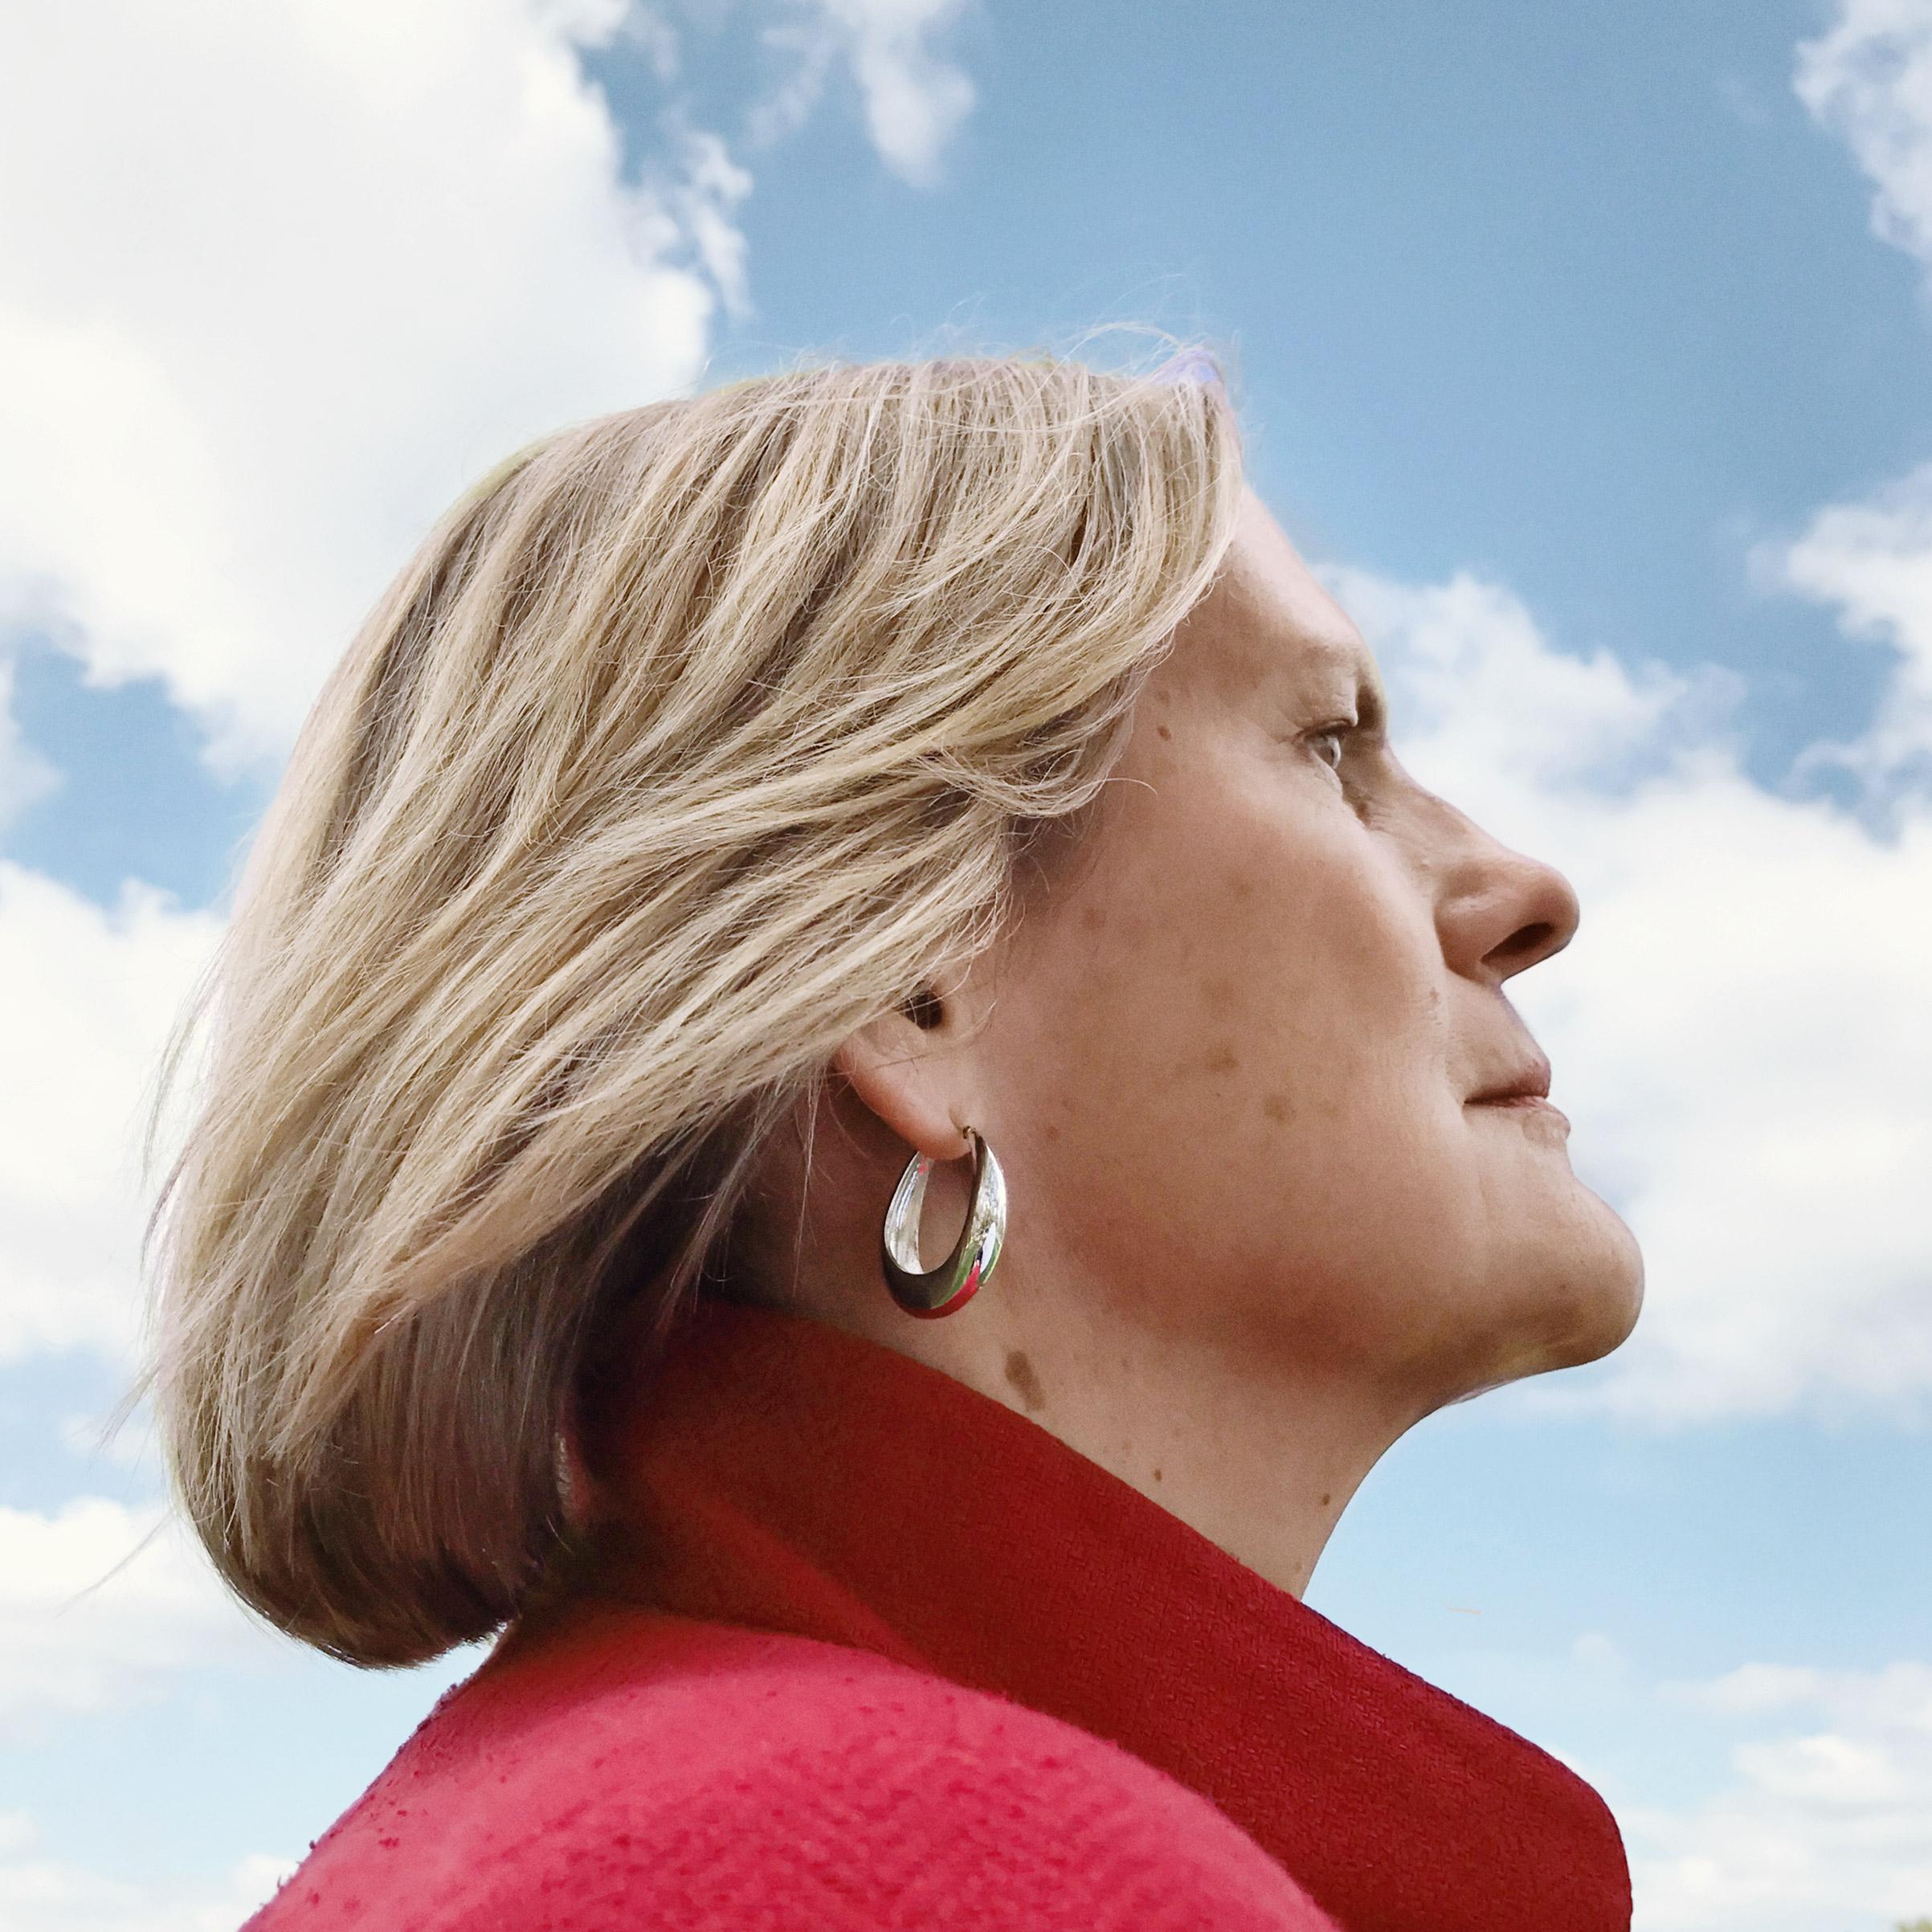 Portrait of Dr. Kathryn Sullivan, Washington, D.C., October 5, 2016.